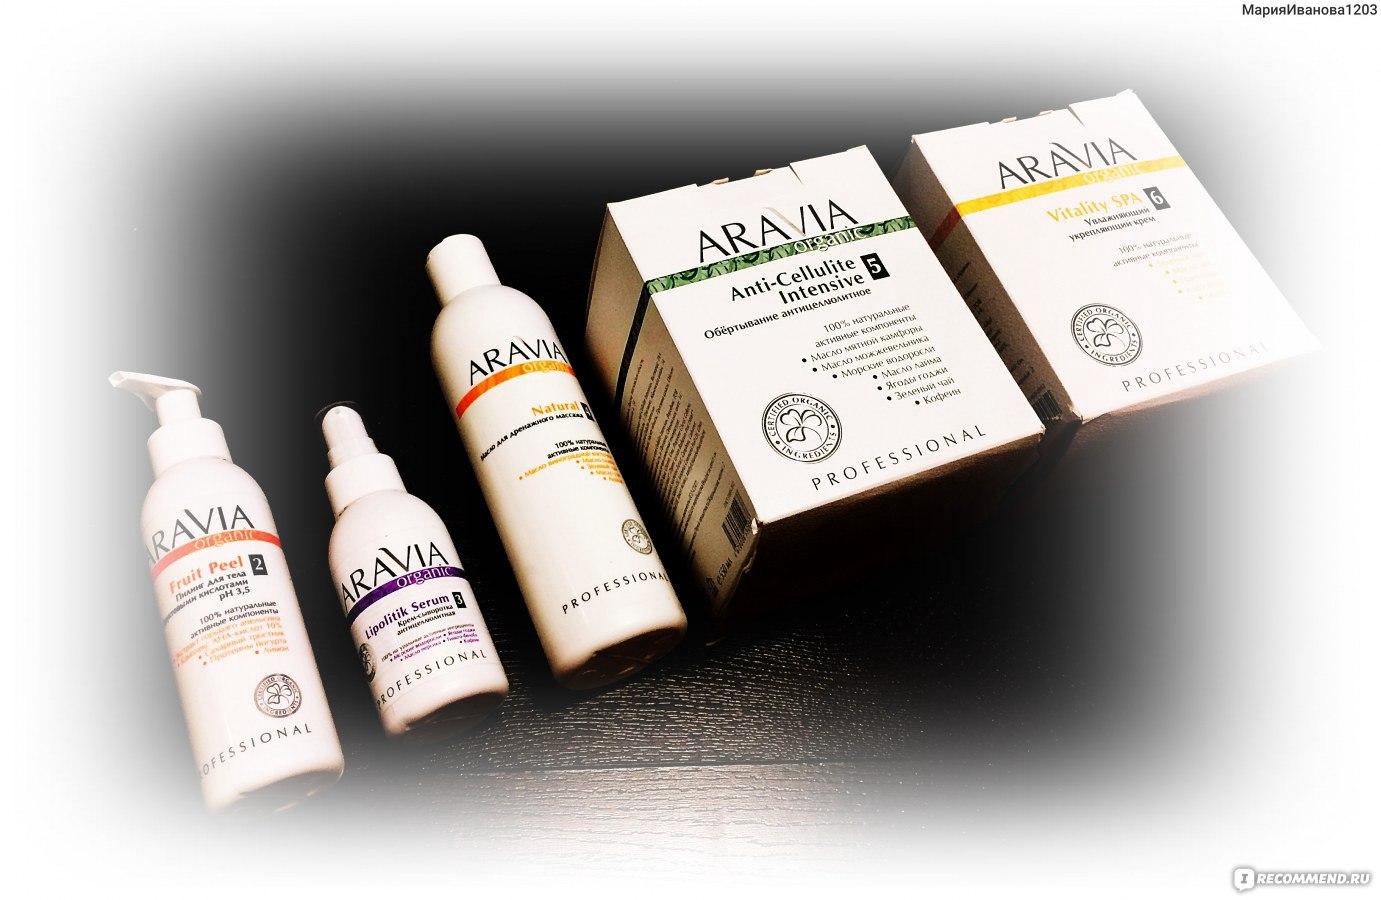 ARAVIA Organic Крем для моделирующего массажа «Slim Shape» 550 мл